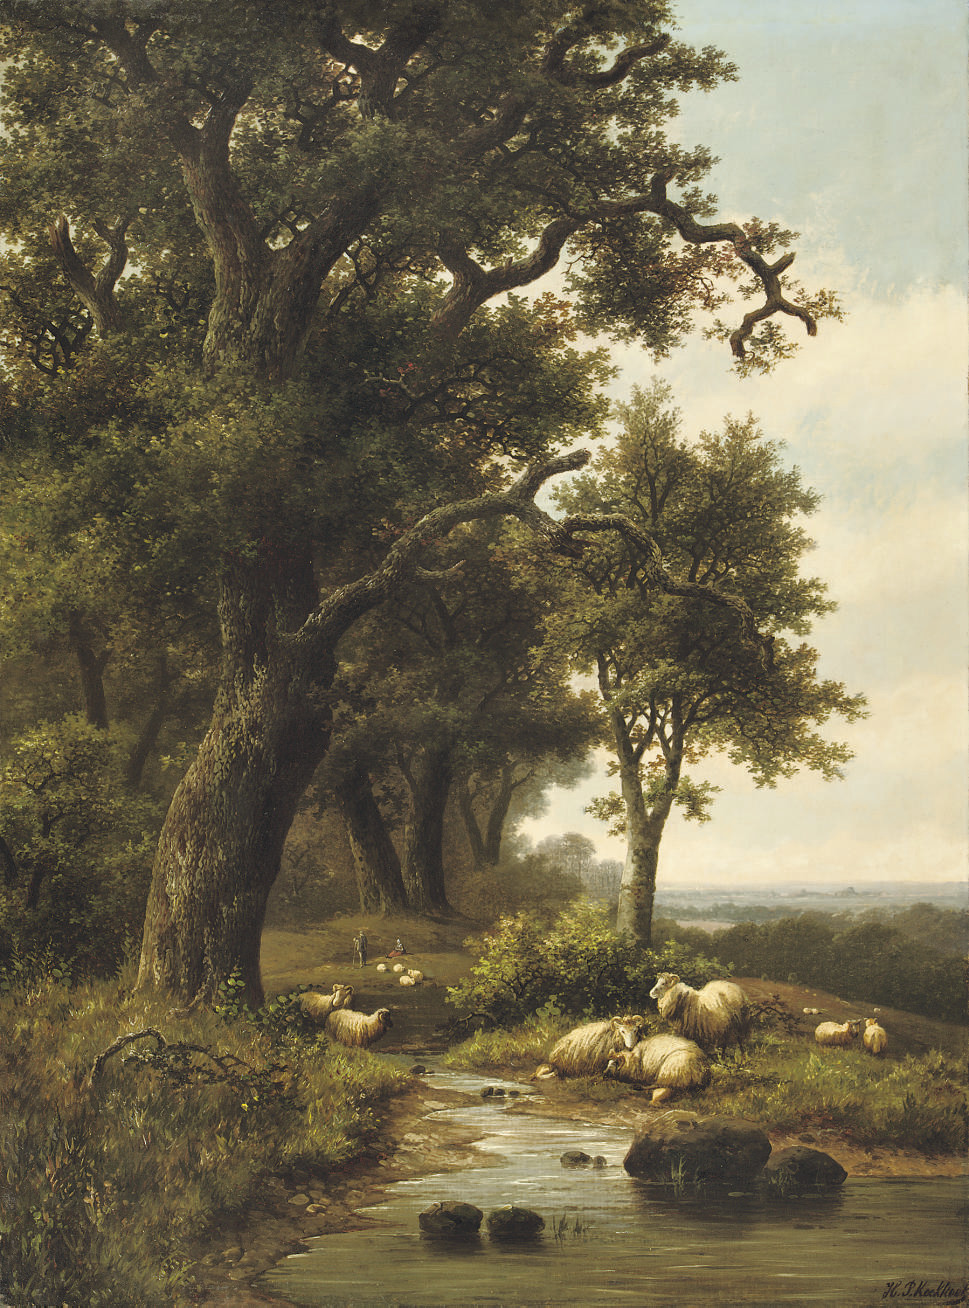 Sheep near a forest stream